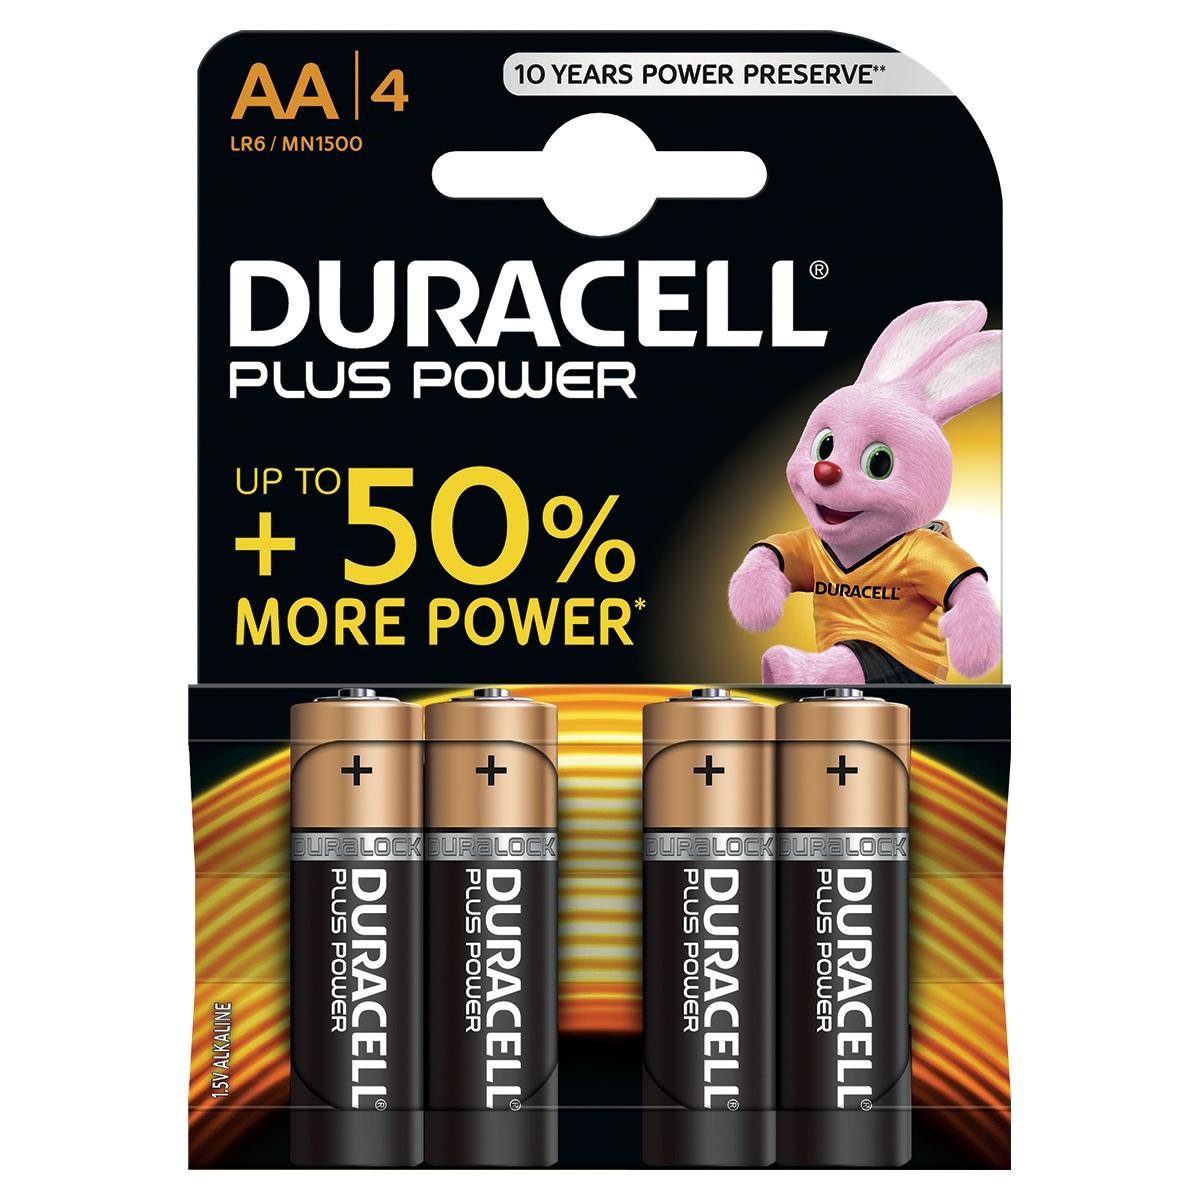 Image for Duracell Plus Power Battery Alkaline 1.5V AA Ref 81275182 [Pack 4]